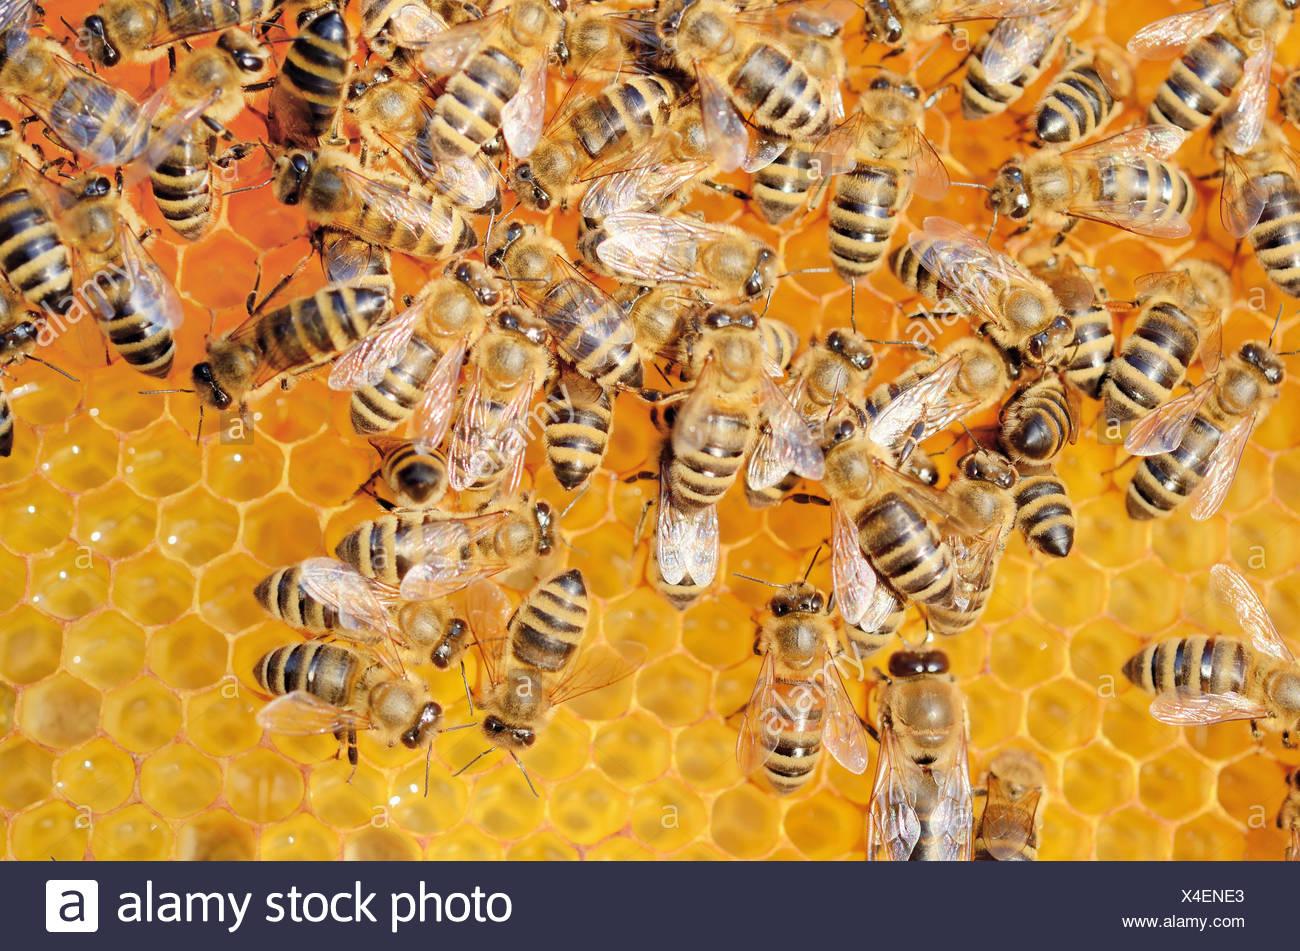 how to keep honeycomb fresh